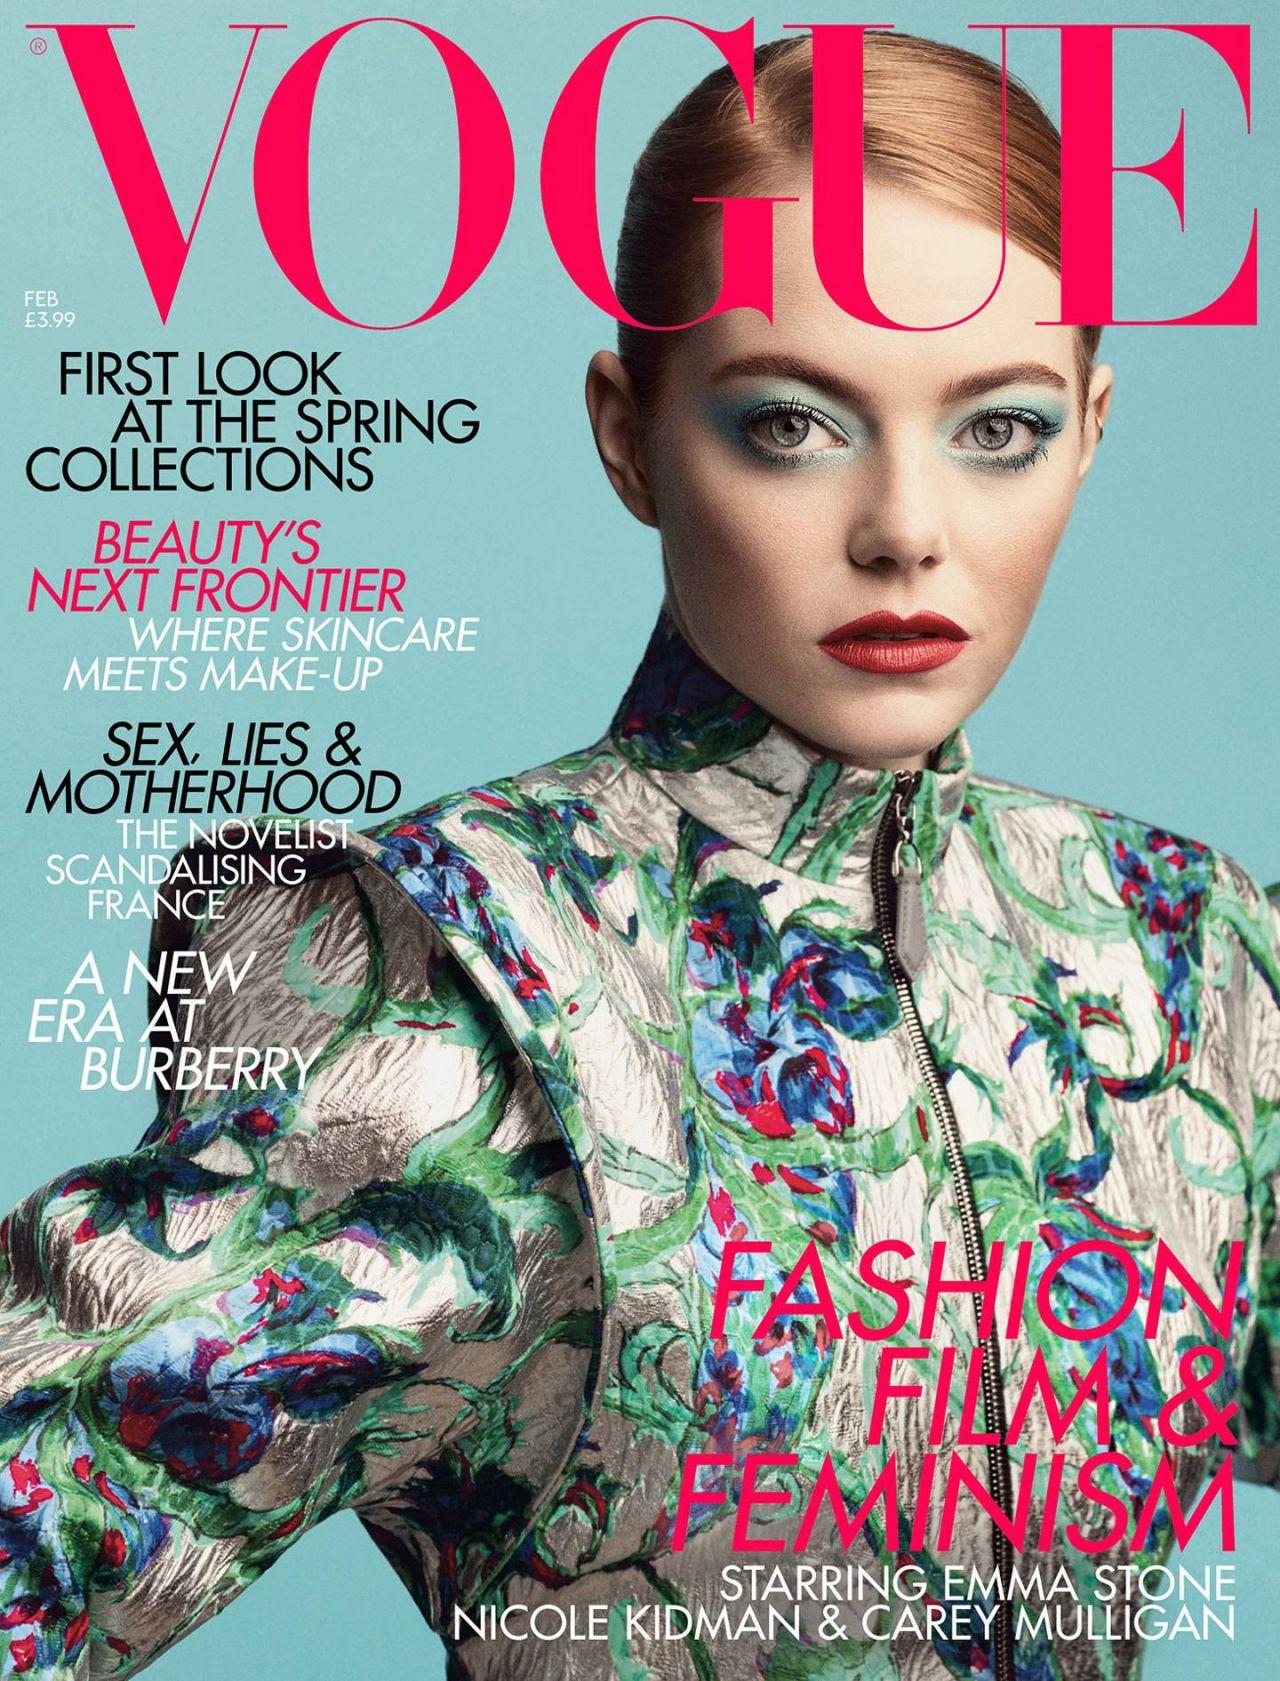 Vogue Magazine Uk May 2015 Issue: VOGUE UK February 2019 Cover And Photos